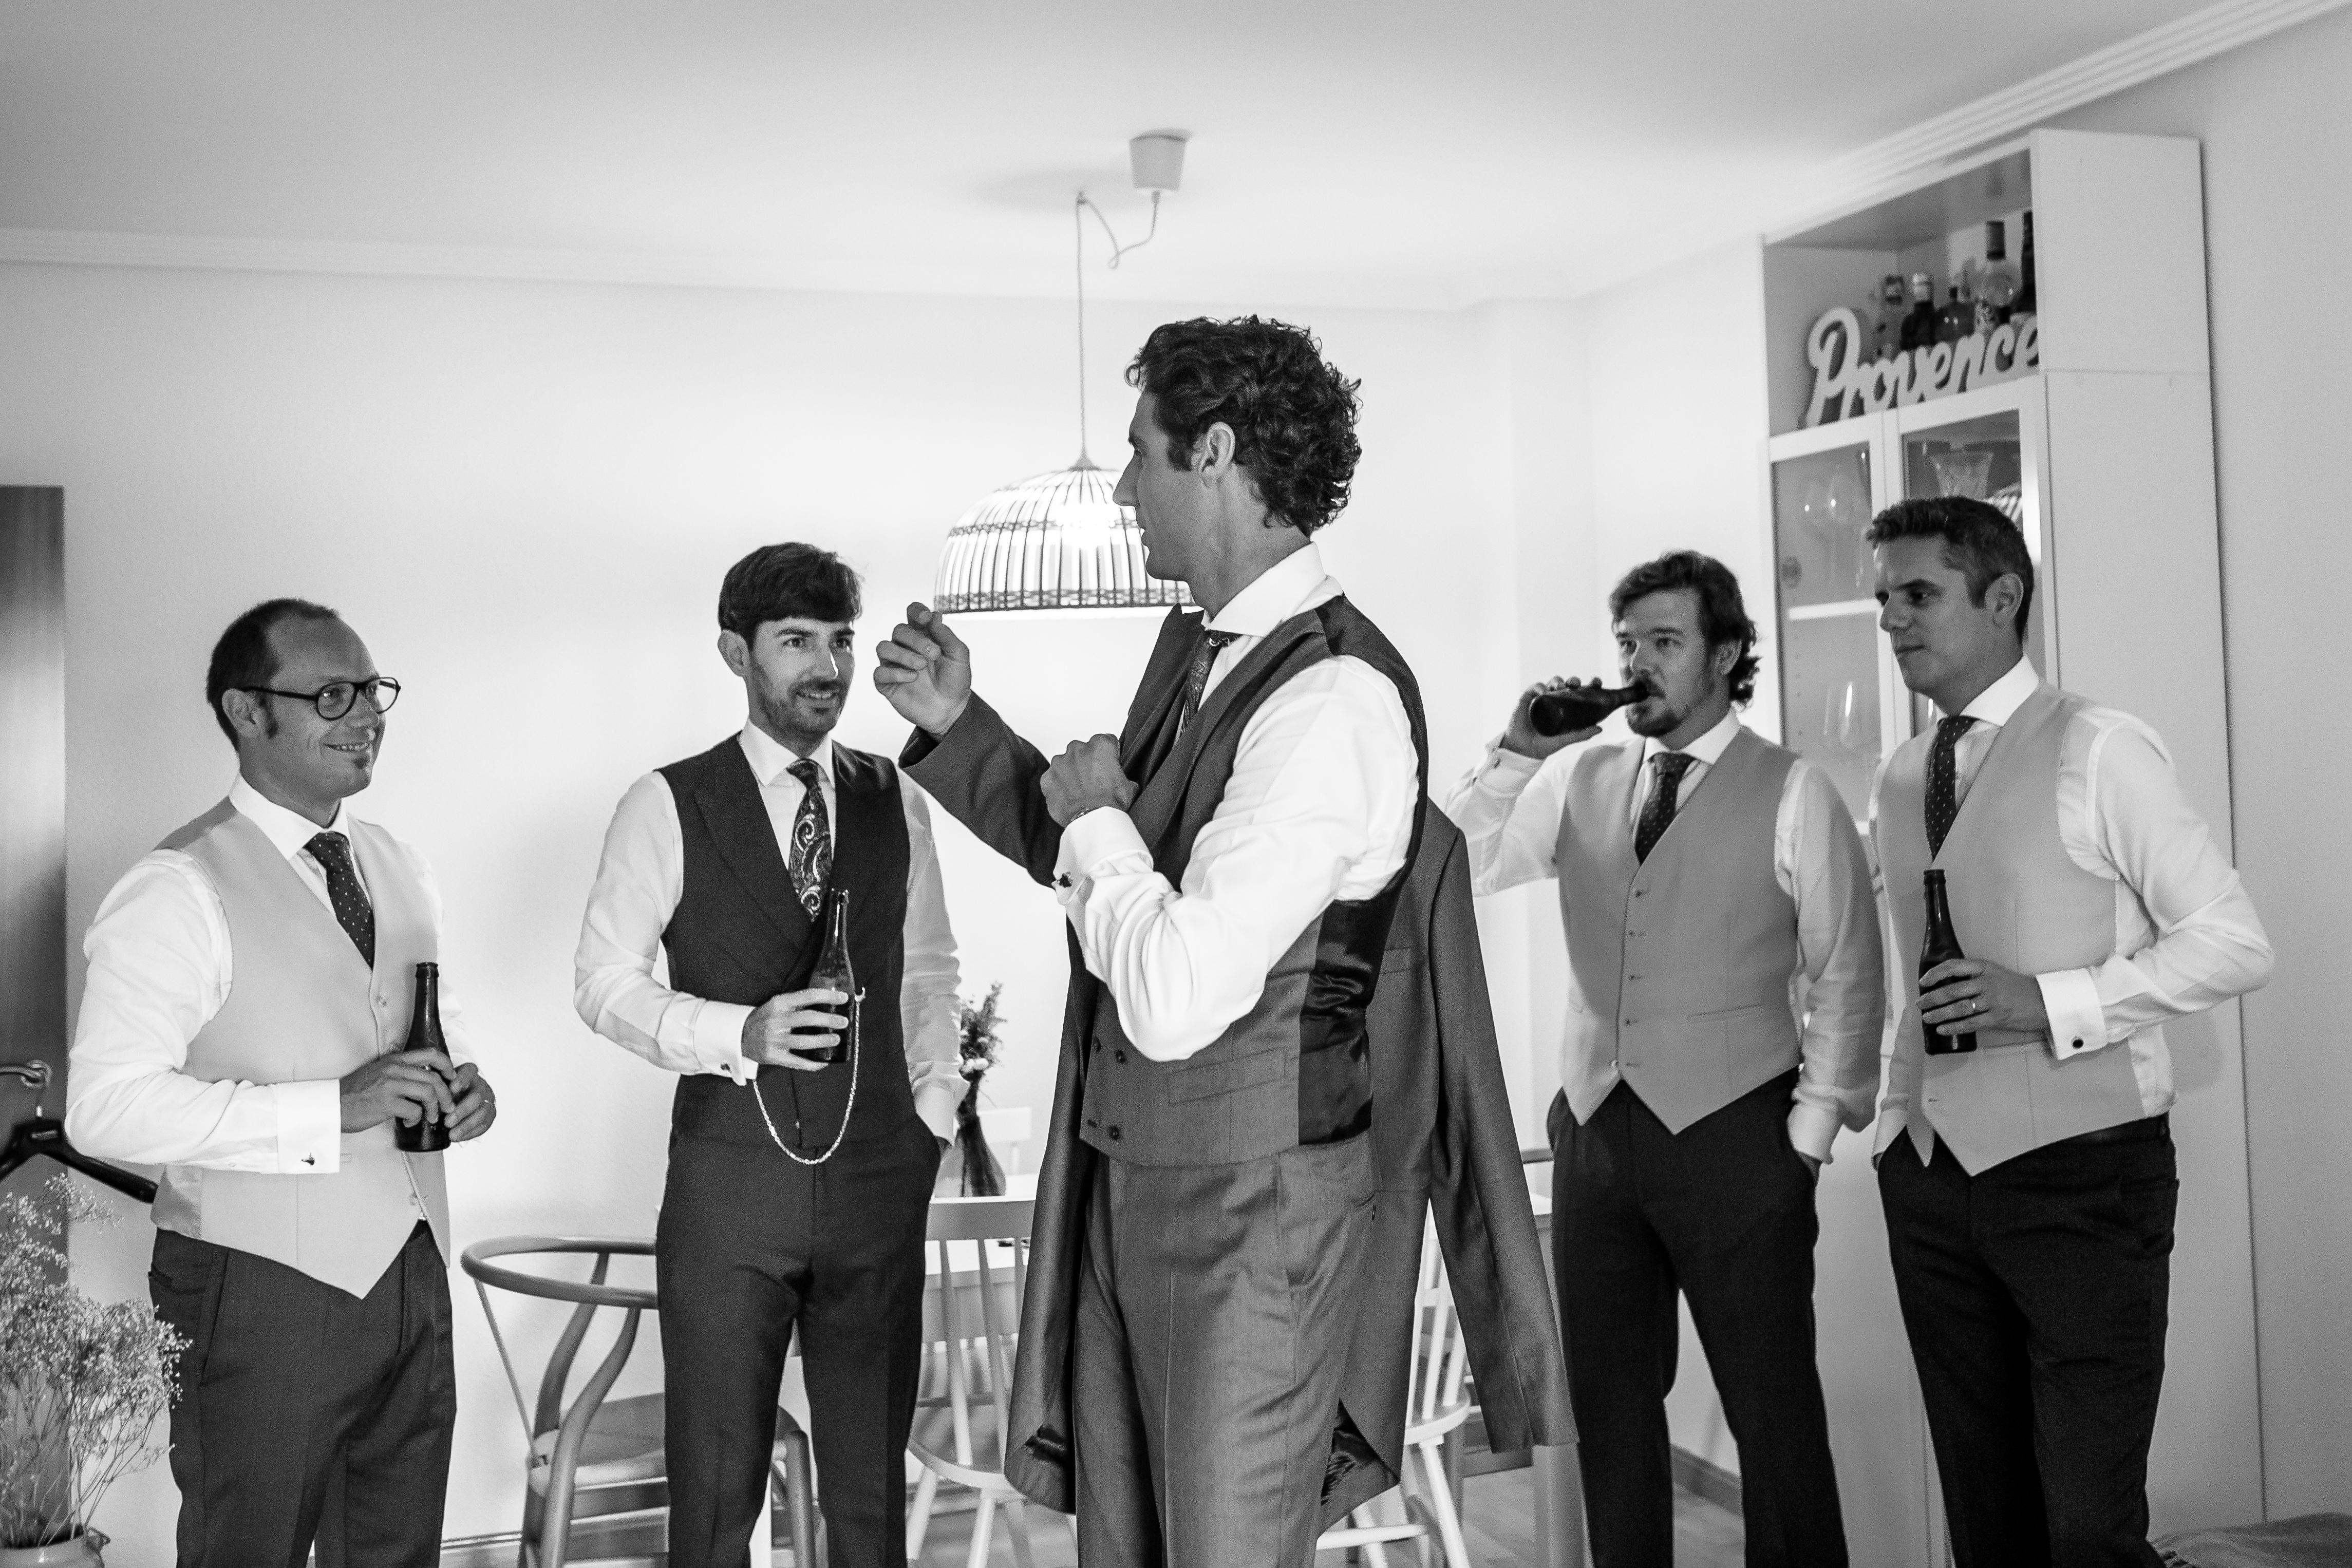 mandarina weddig, fotografos de boda, fotografo boda soria, fotografo boda barcelona, fotografo boda Madrid, fotografo boda lerida, fotografo boda Huesca_21